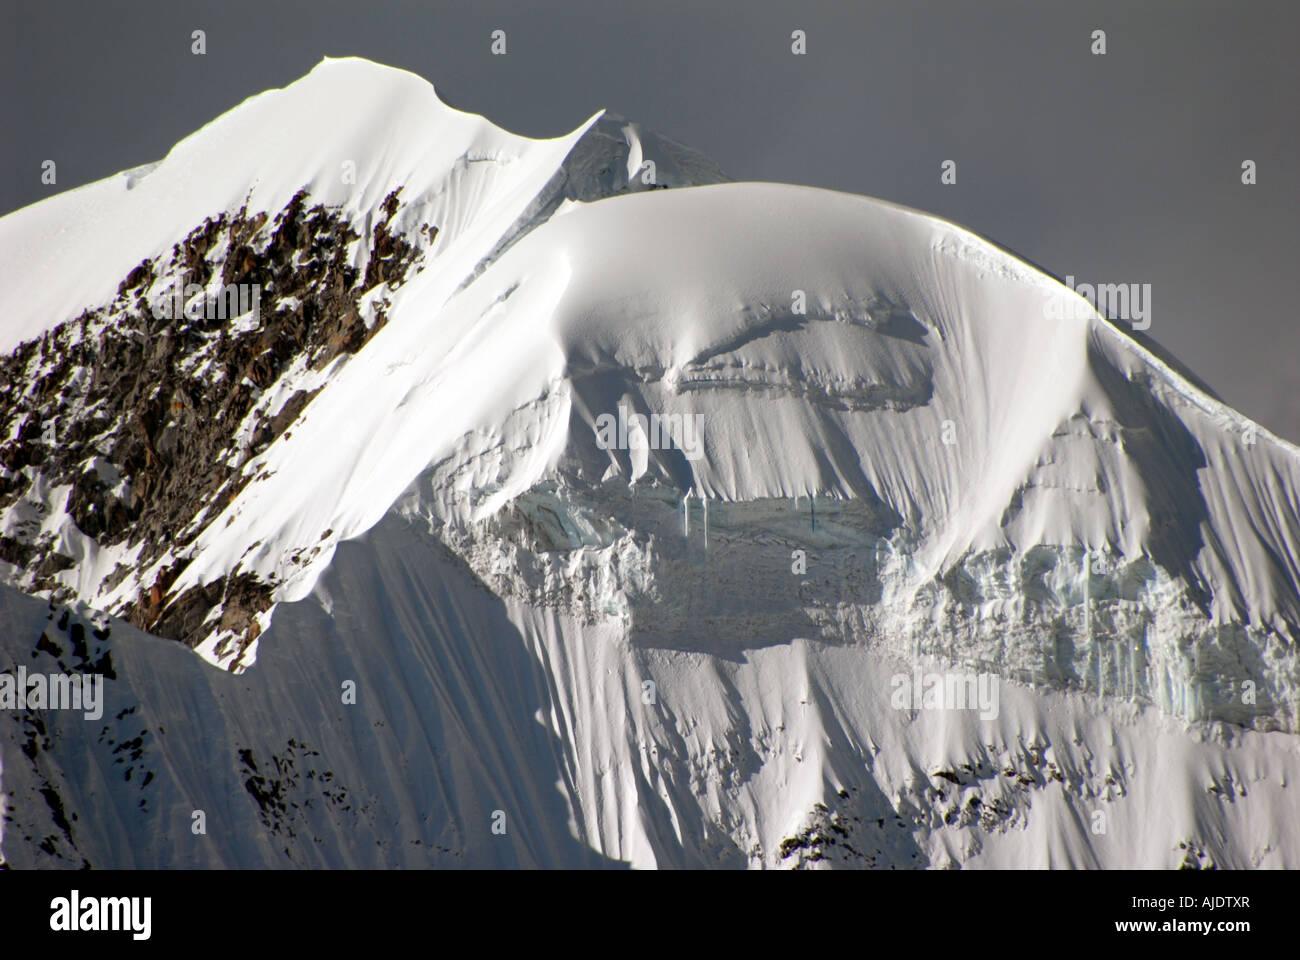 Mount Illiampu massif as viewed from Lagunas Glaciar near Sorata, Bolivia, South America. - Stock Image